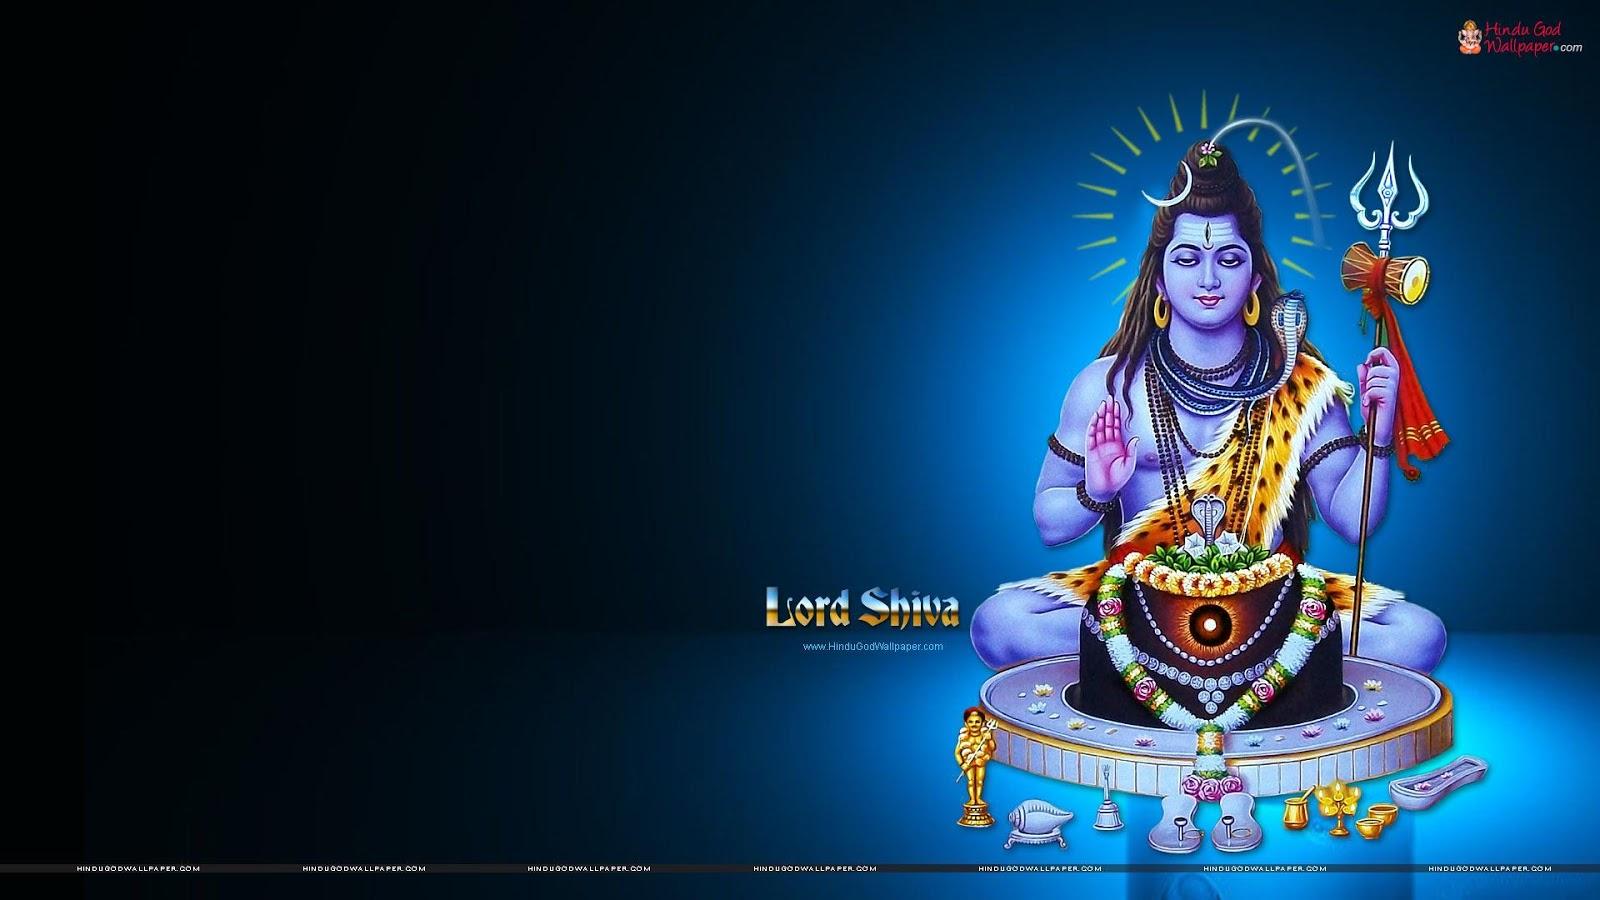 Wallpaper Pics Of Lord Shiva Download Free: Lord Shiva Wallpapers HD 4K 1.1 APK Download